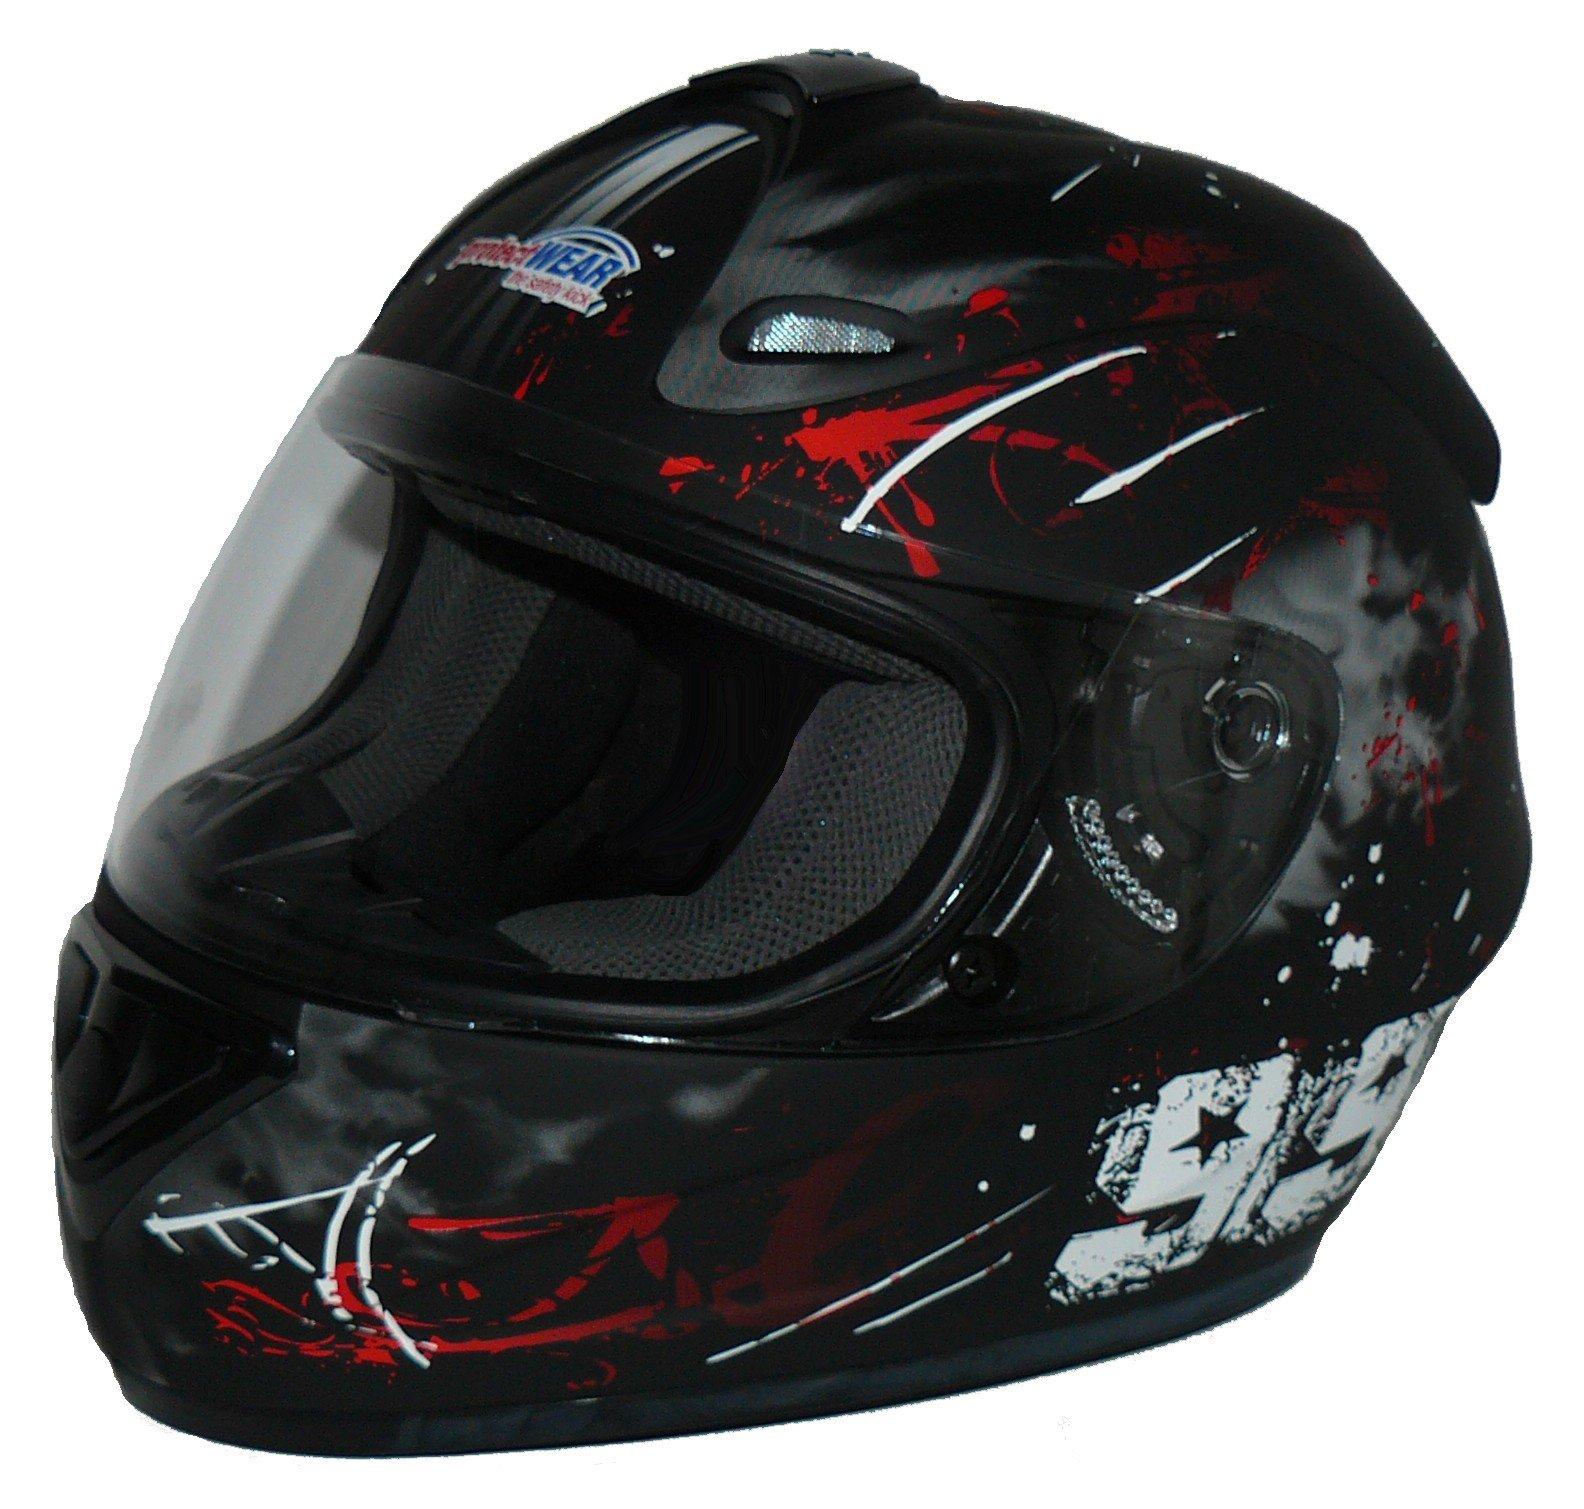 Amazon.es: Protectwear Casco de moto negro-rojo 99 FS-801-99R Tamaño L